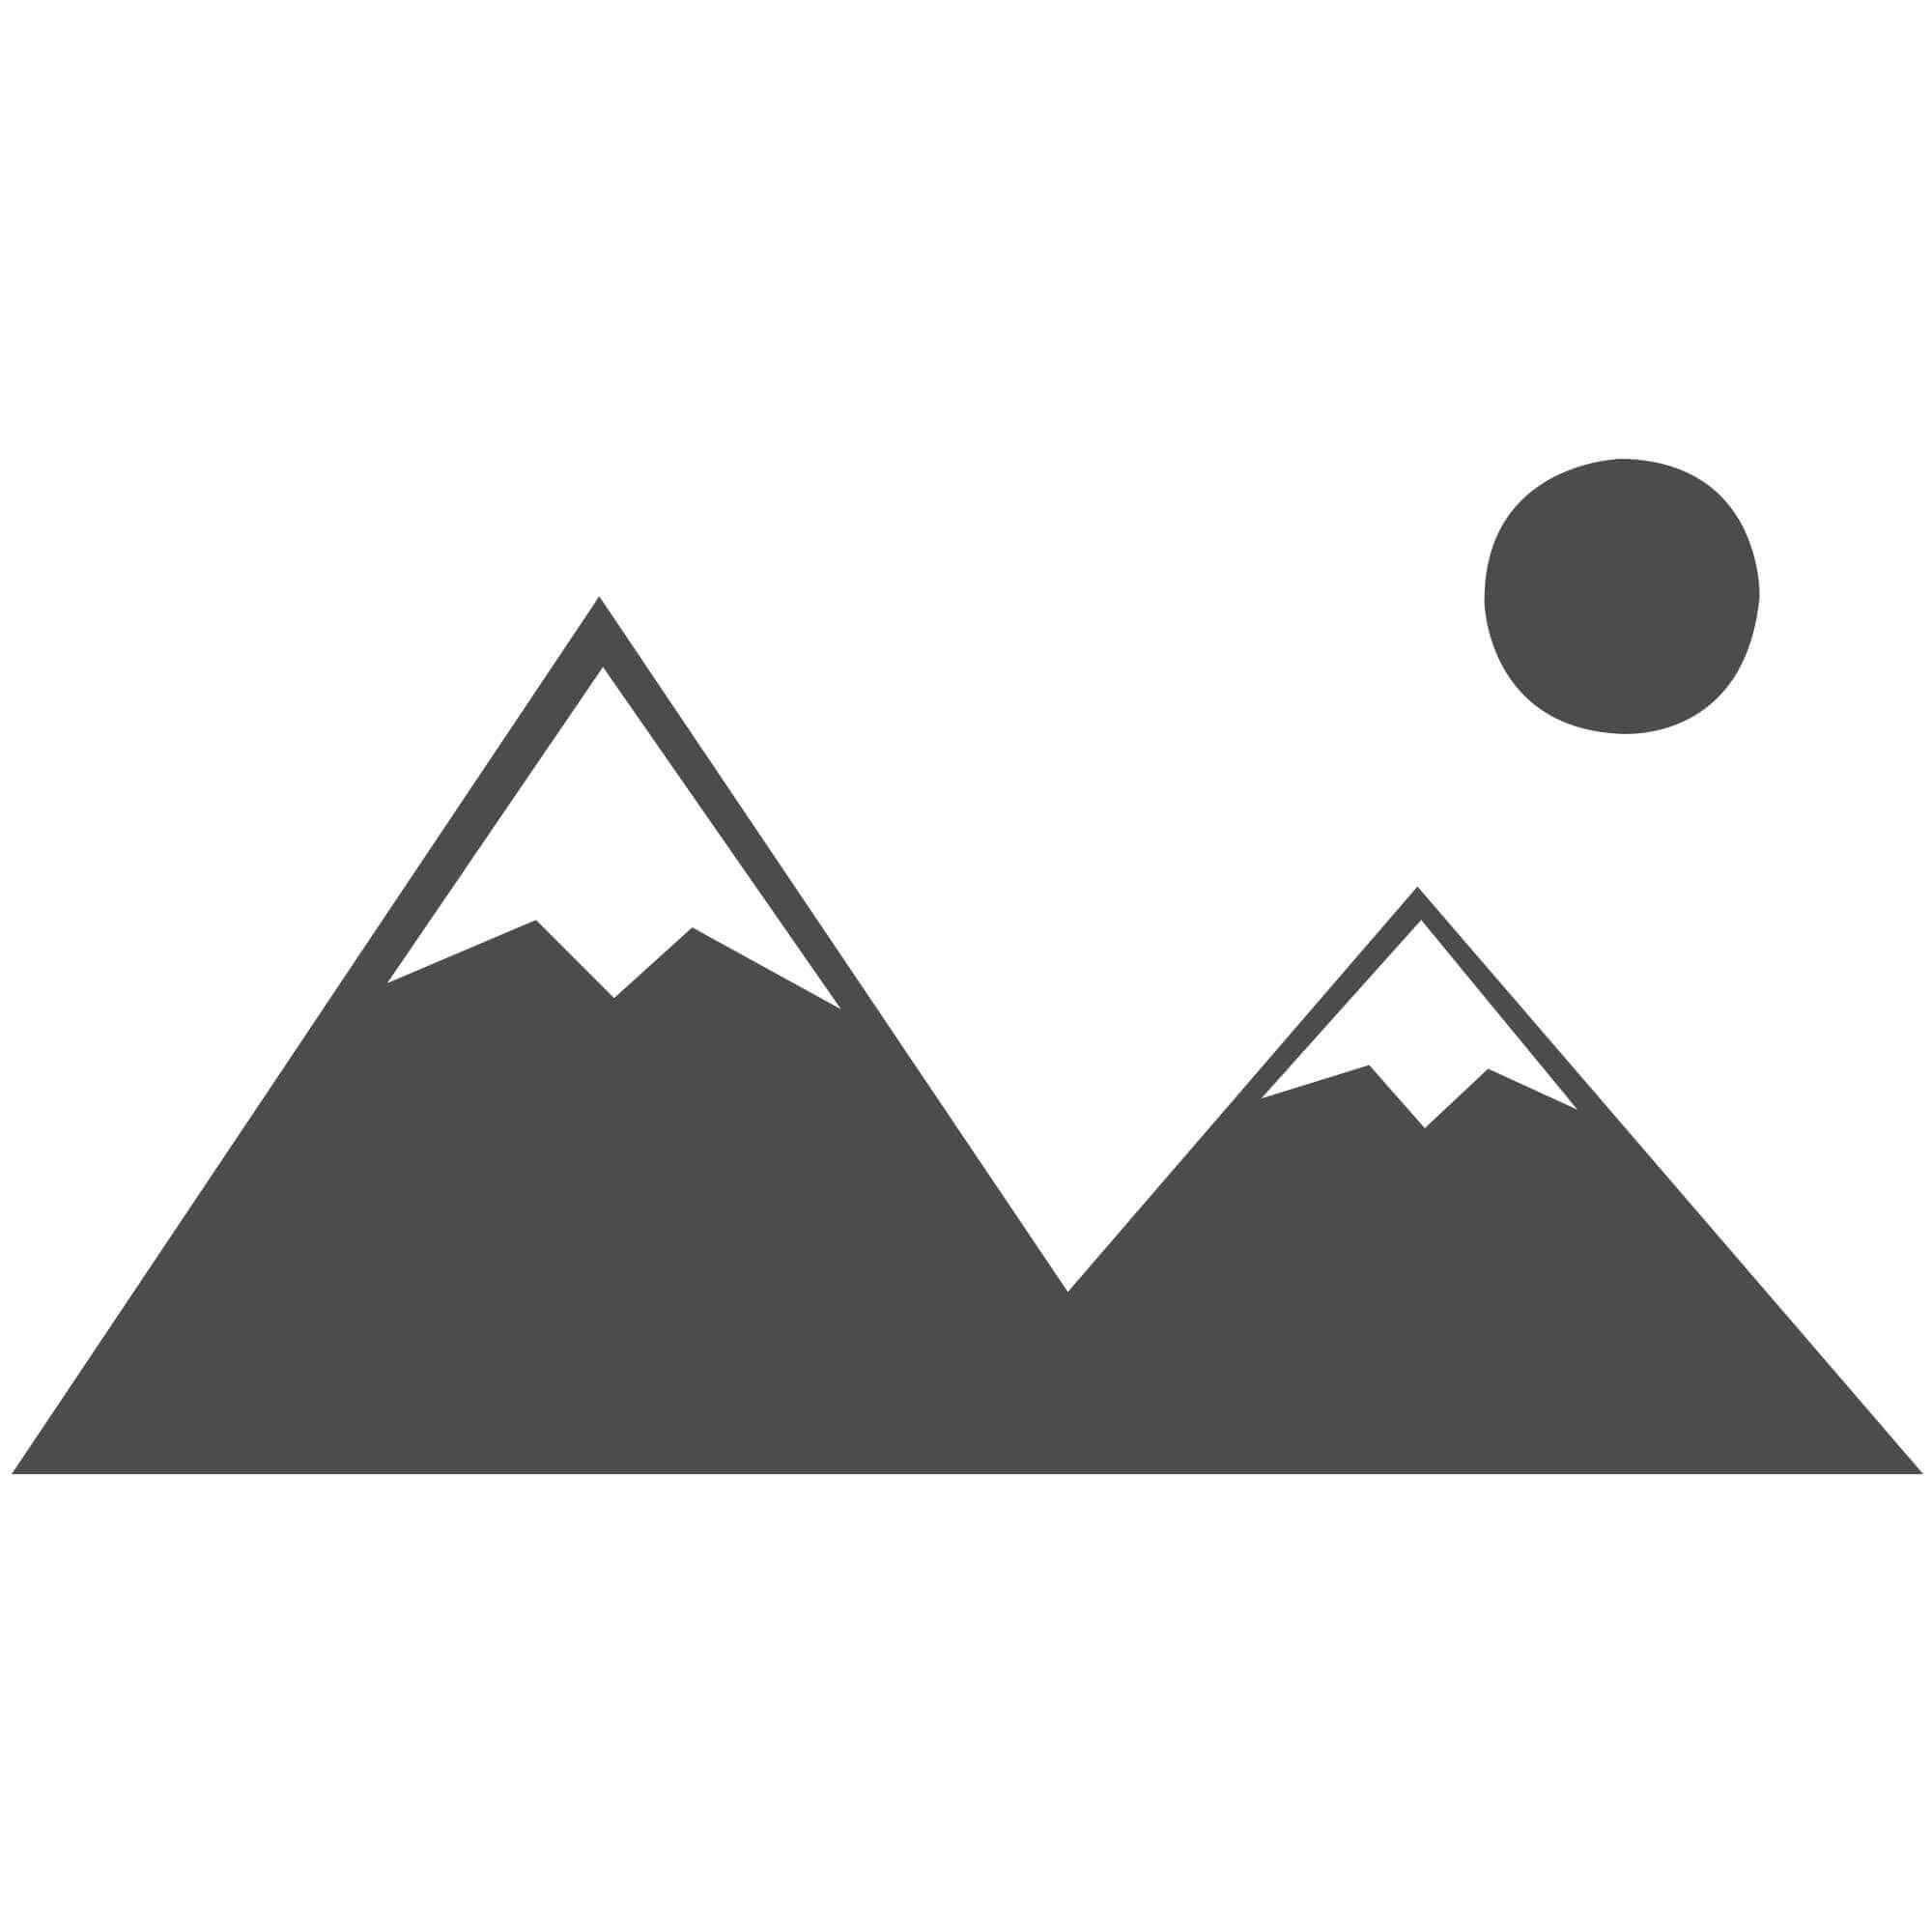 Eko 3010 slim line gas fire - Brass